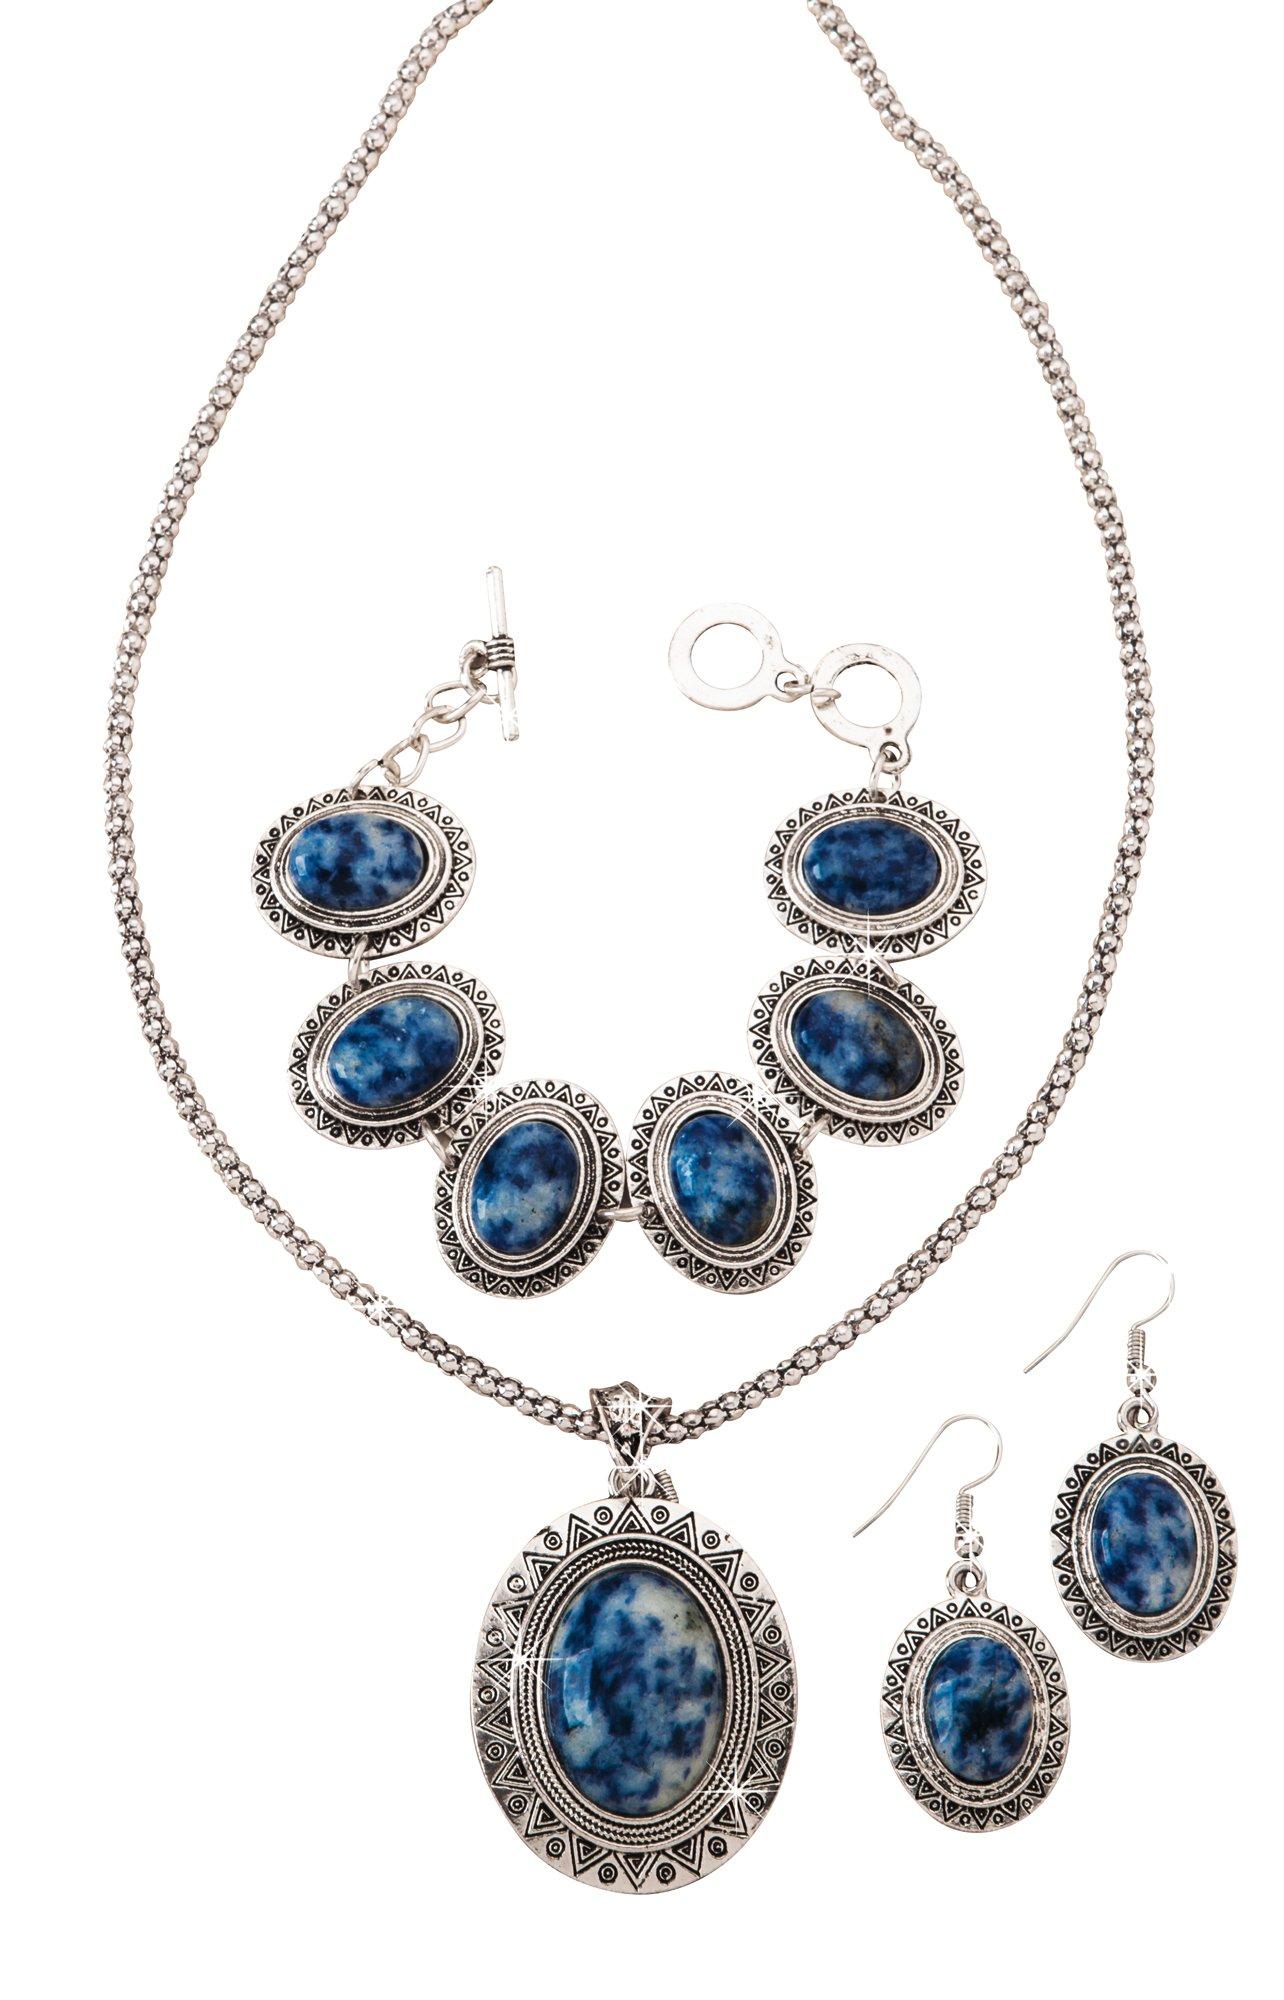 The Paragon Sodalite Southwestern Jewelry Set - 3 pc. Set